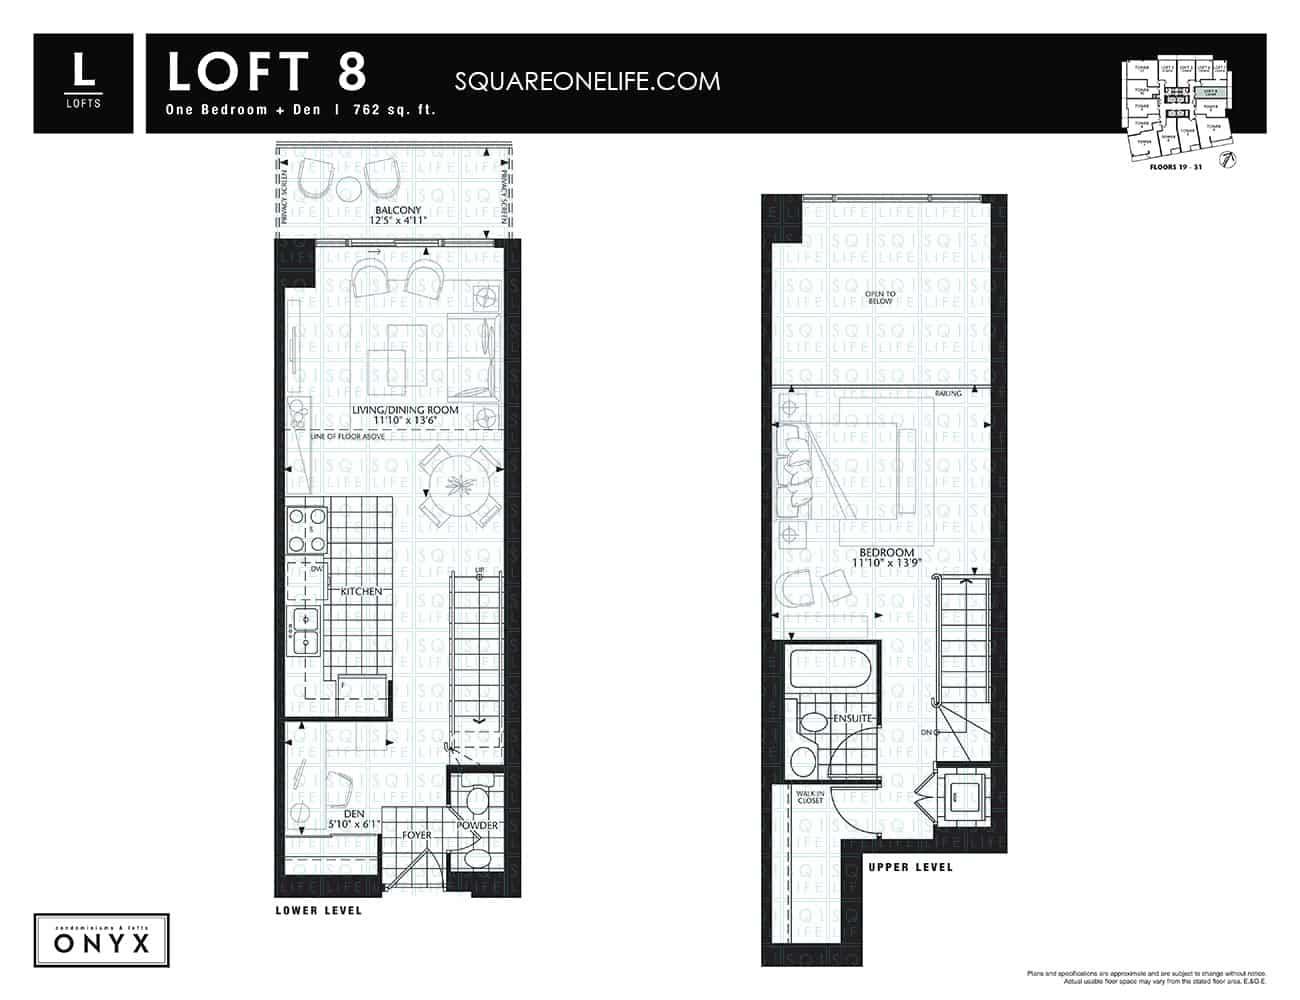 223-Webb-Dr-Onyx-Condo-Floorplan-Loft-8-1-Bed-1-Den onyx condo Onyx Condo 223 Webb Dr Onyx Condo Floorplan Loft 8 1 Bed 1 Den